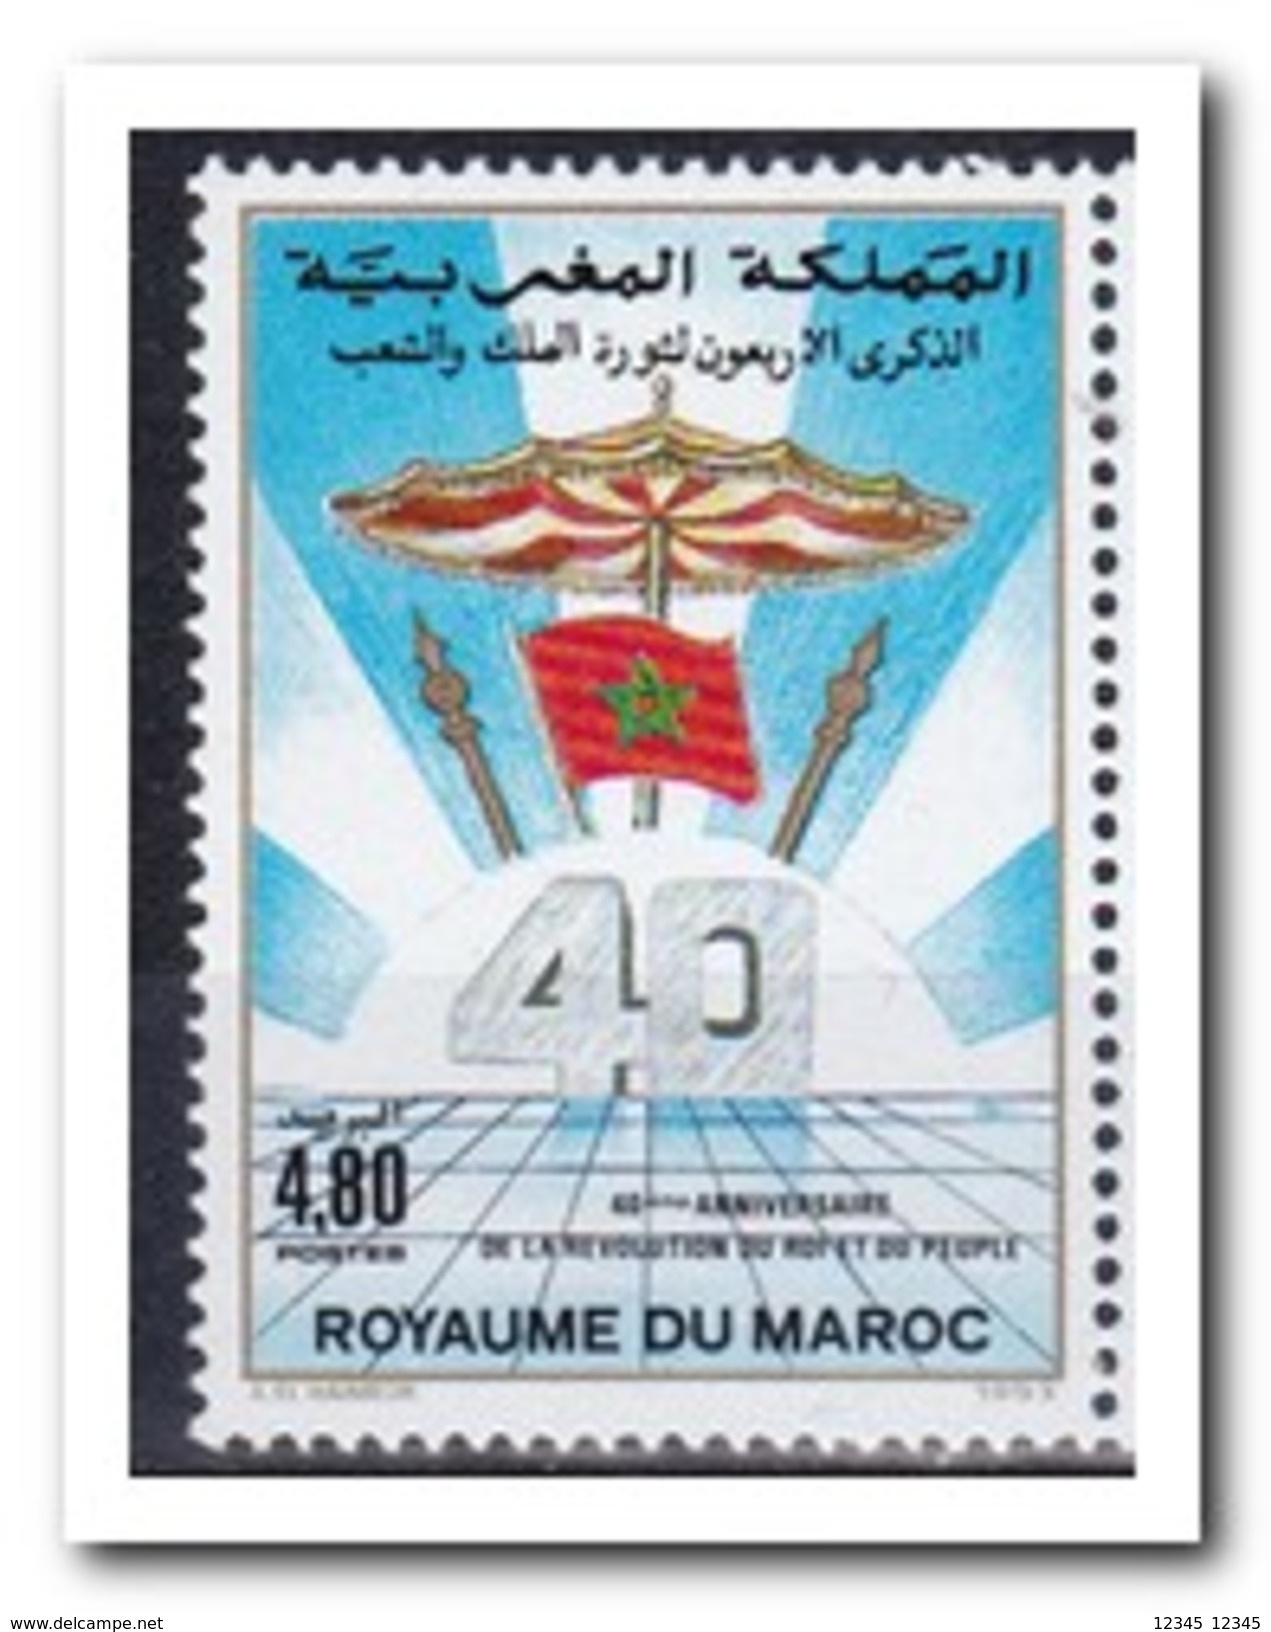 Marokko 1993, Postfris MNH, Anniversary Of The Revolution - Marokko (1956-...)